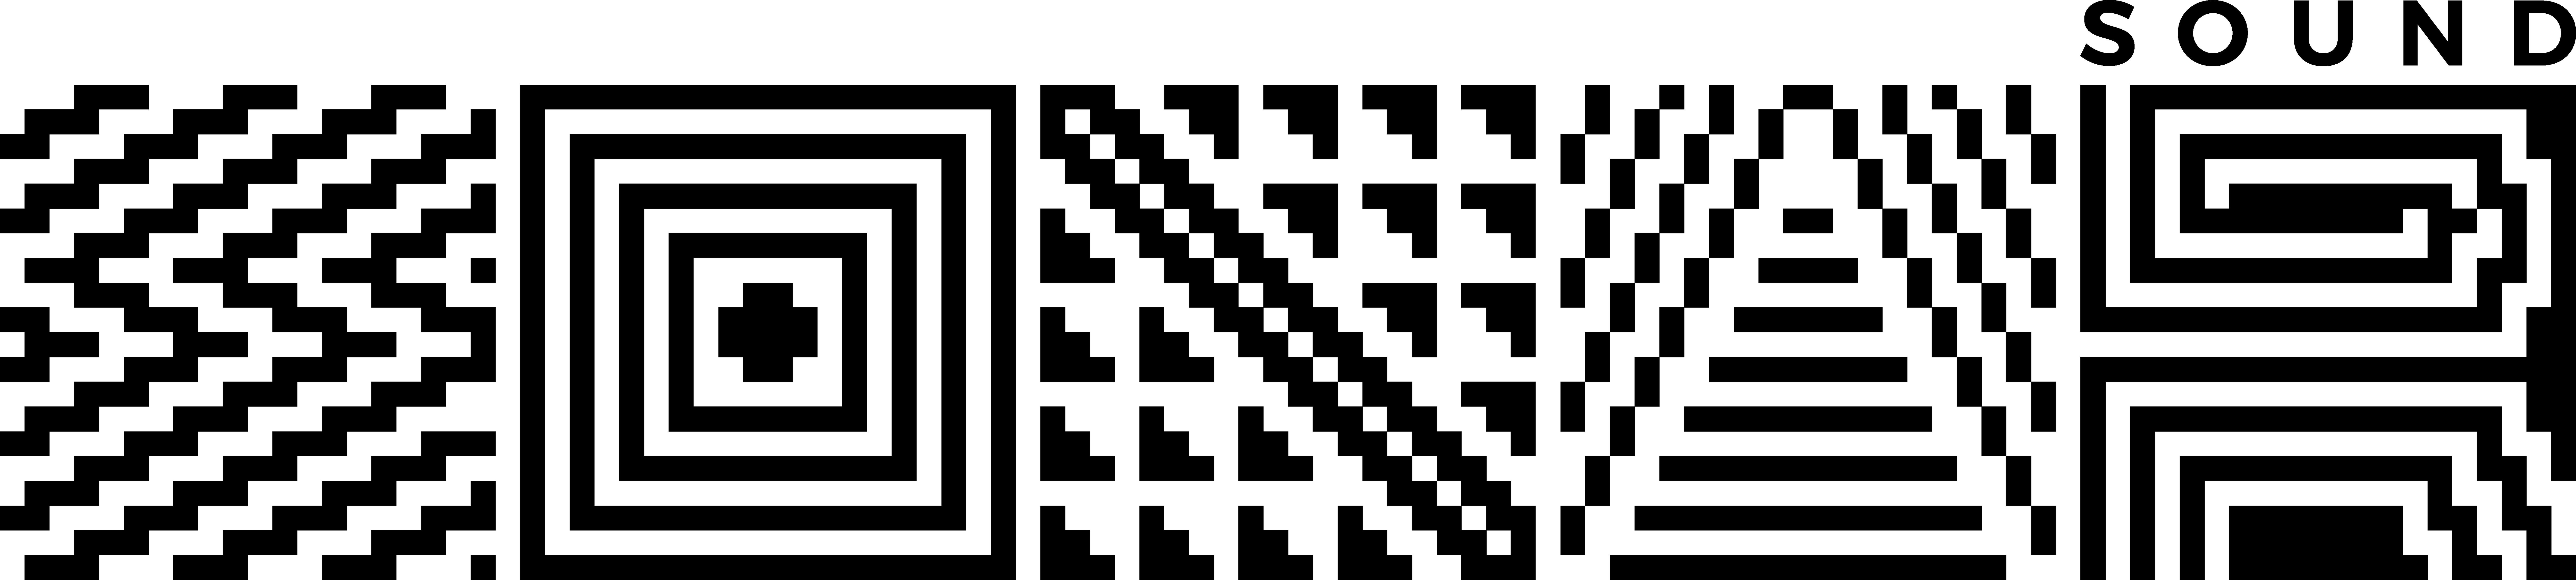 Sonar Sound logo